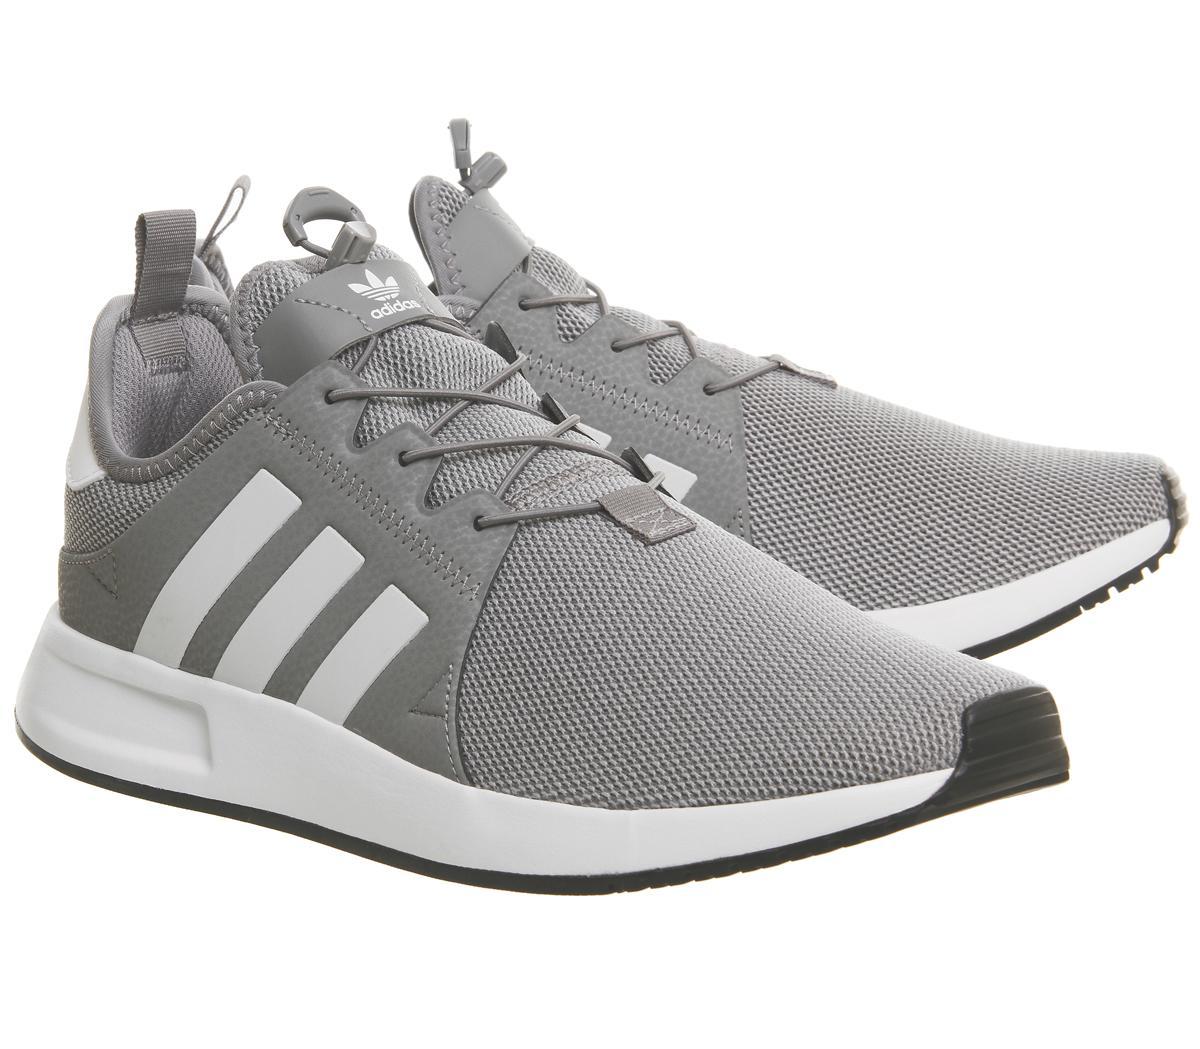 adidas Neoprene X_plr in Grey (Grey